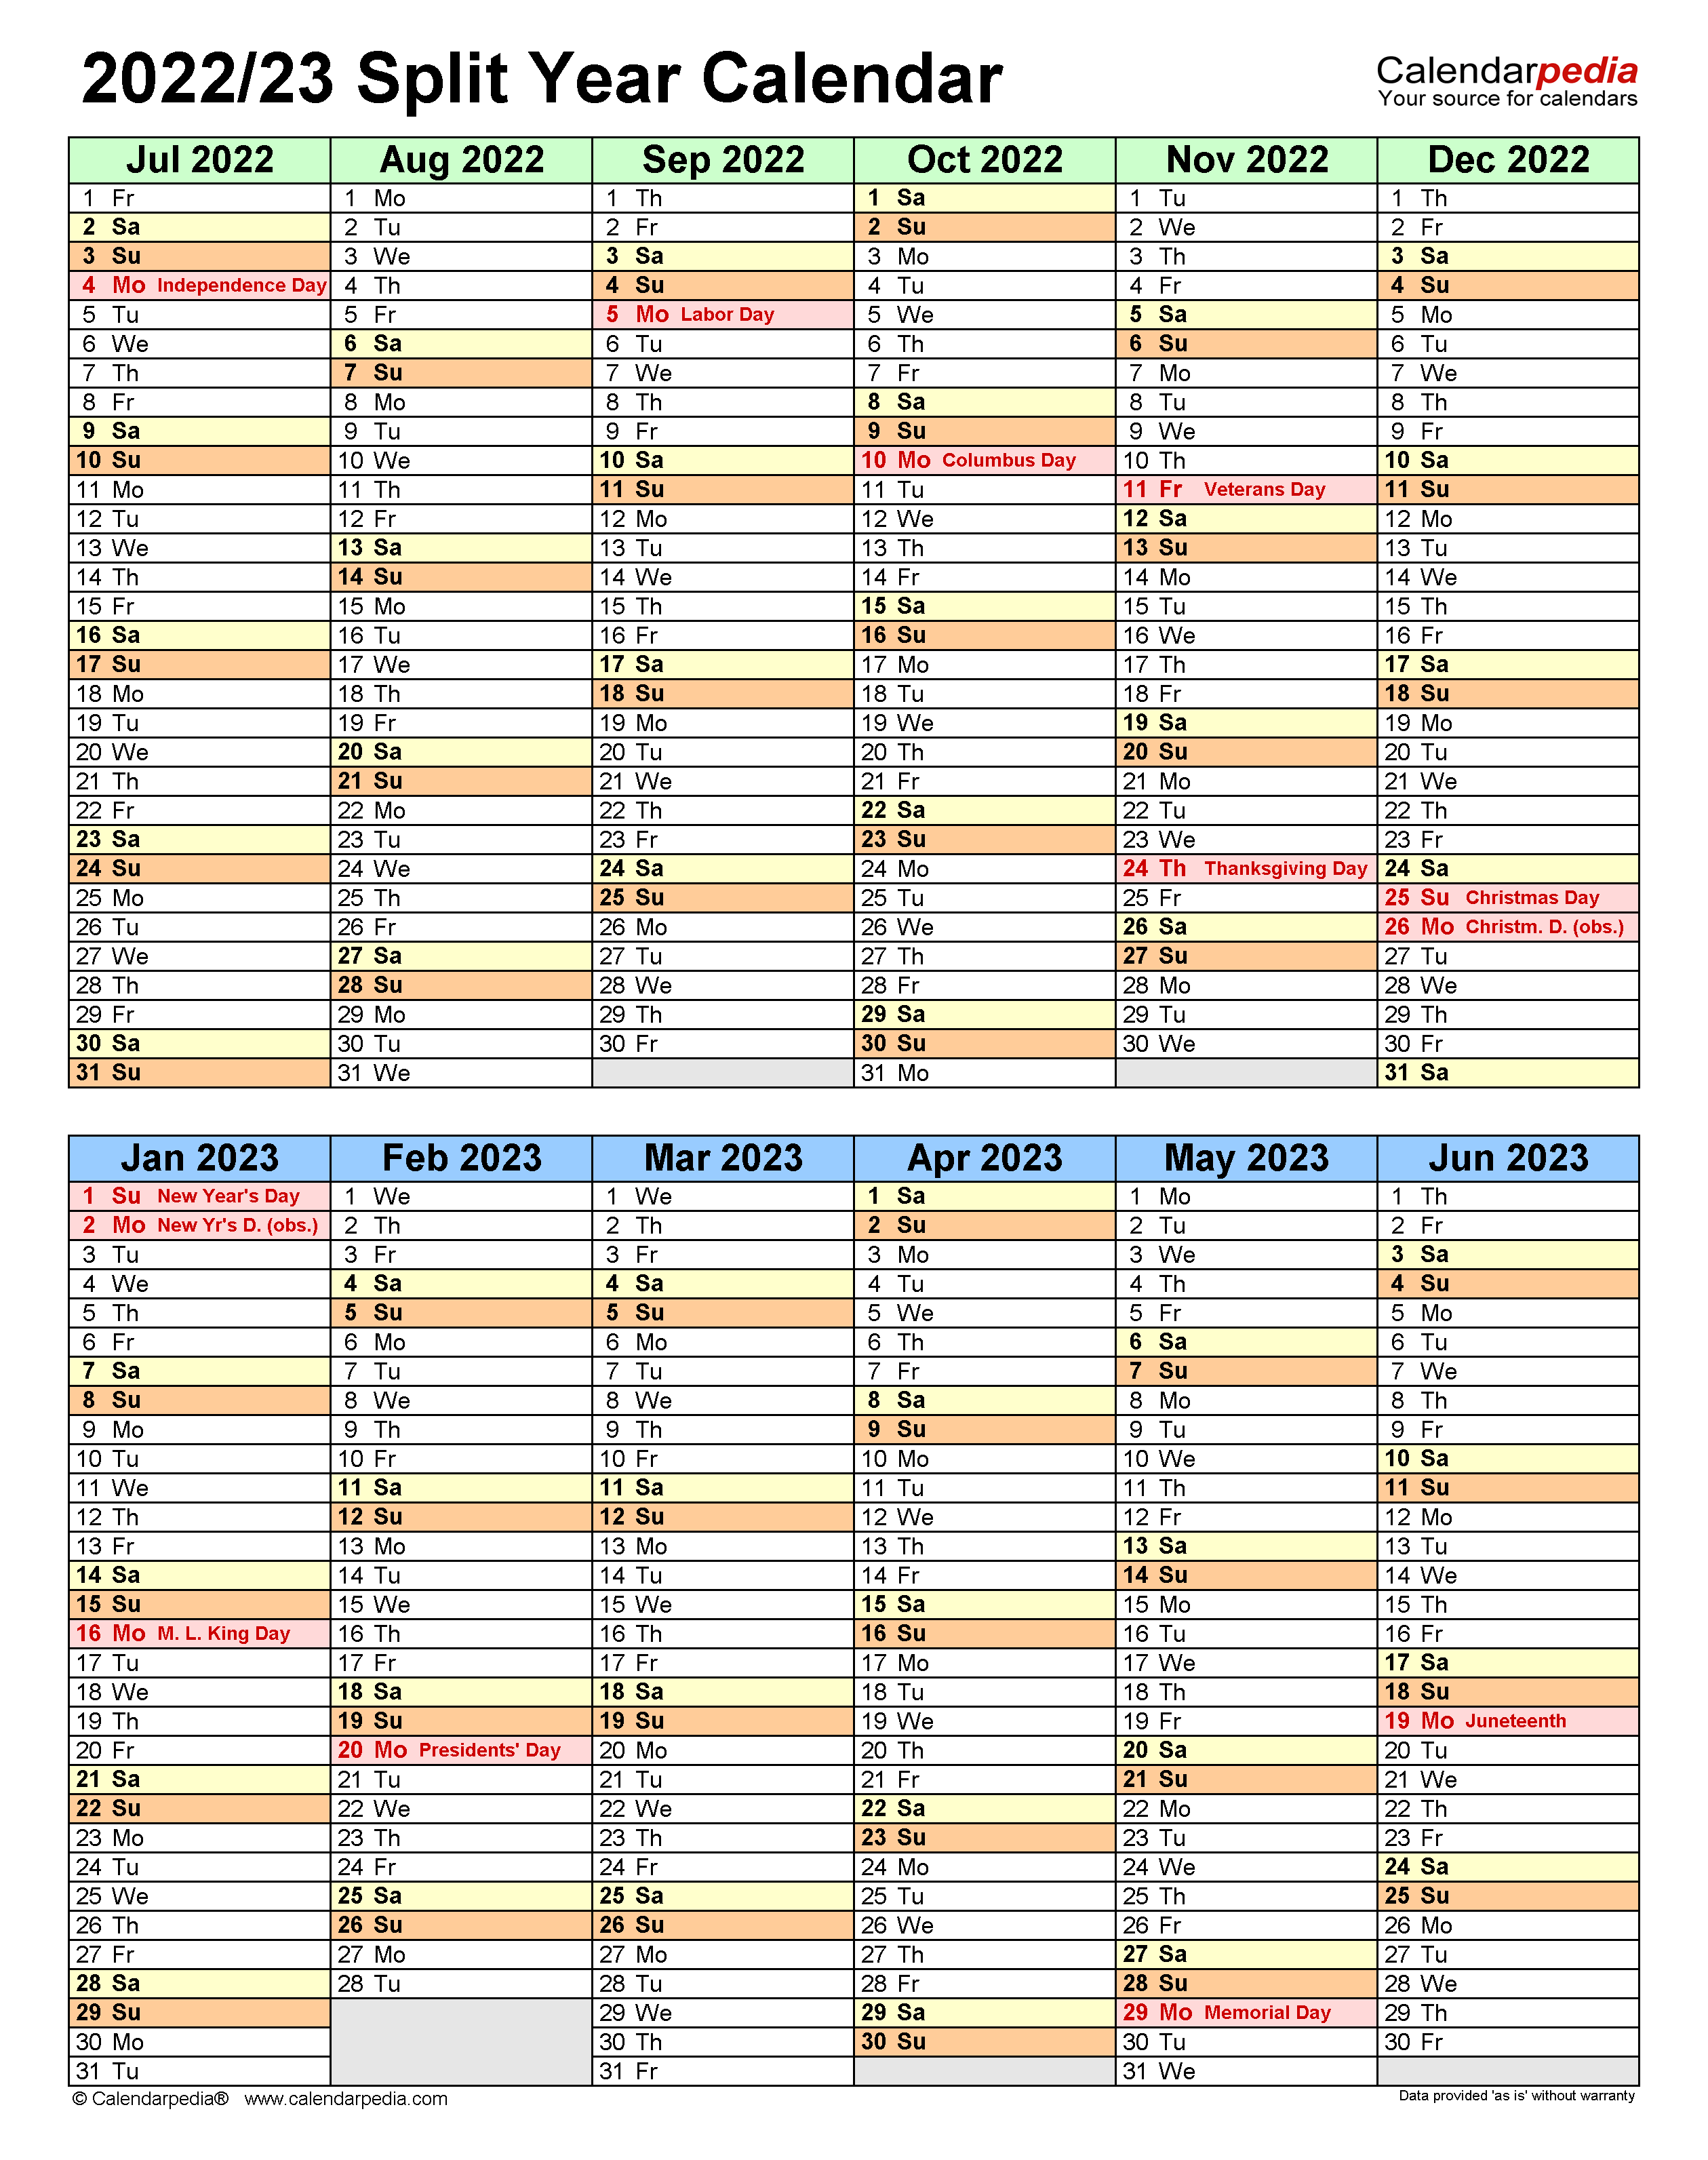 Purdue Calendar 2022 2023.Split Year Calendars 2022 2023 July To June Pdf Templates